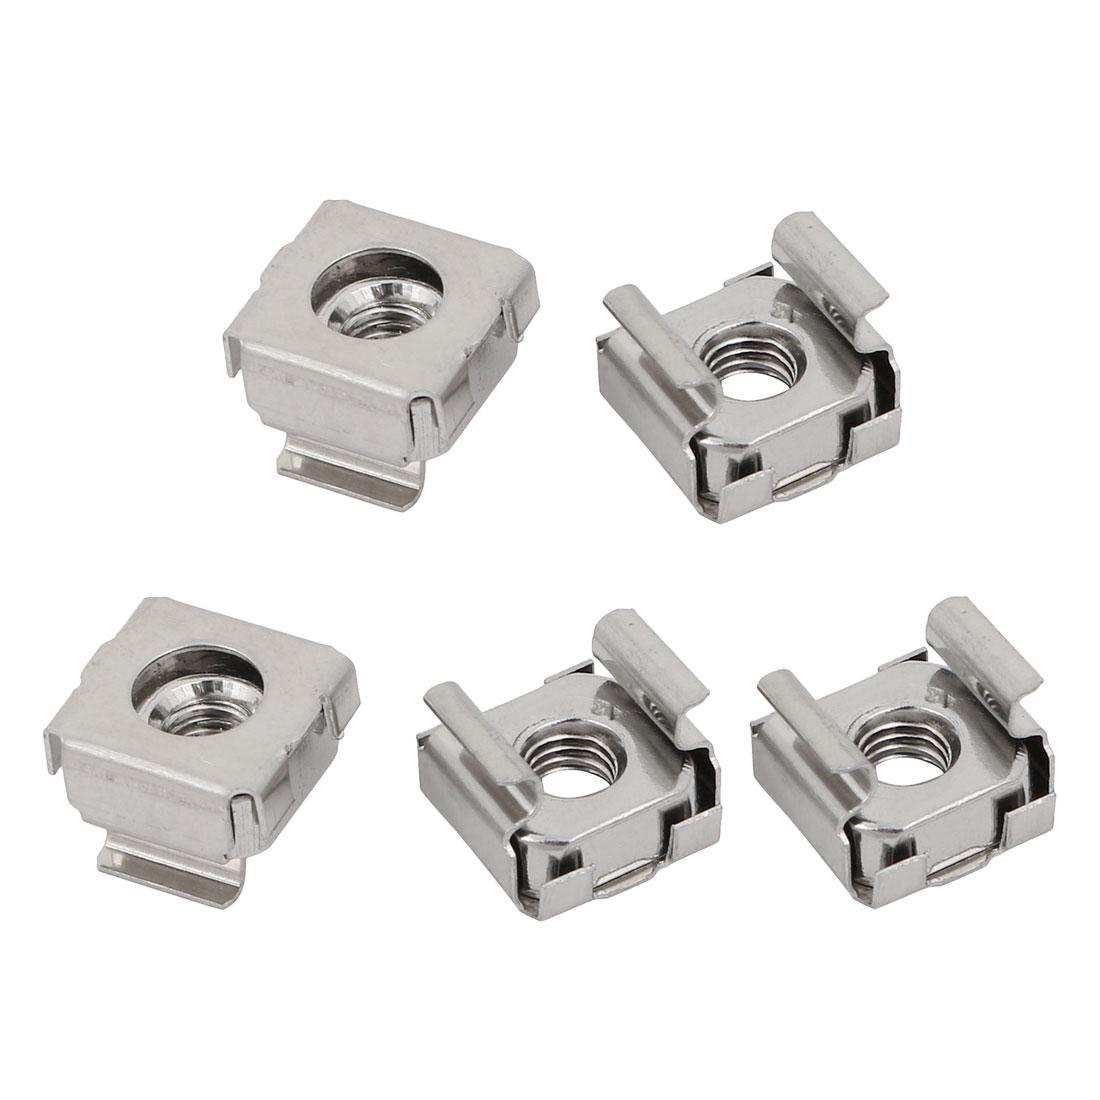 5pcs M5 304 Stainless Steel Cage Nut for Server Shelves Shelf Cabinet